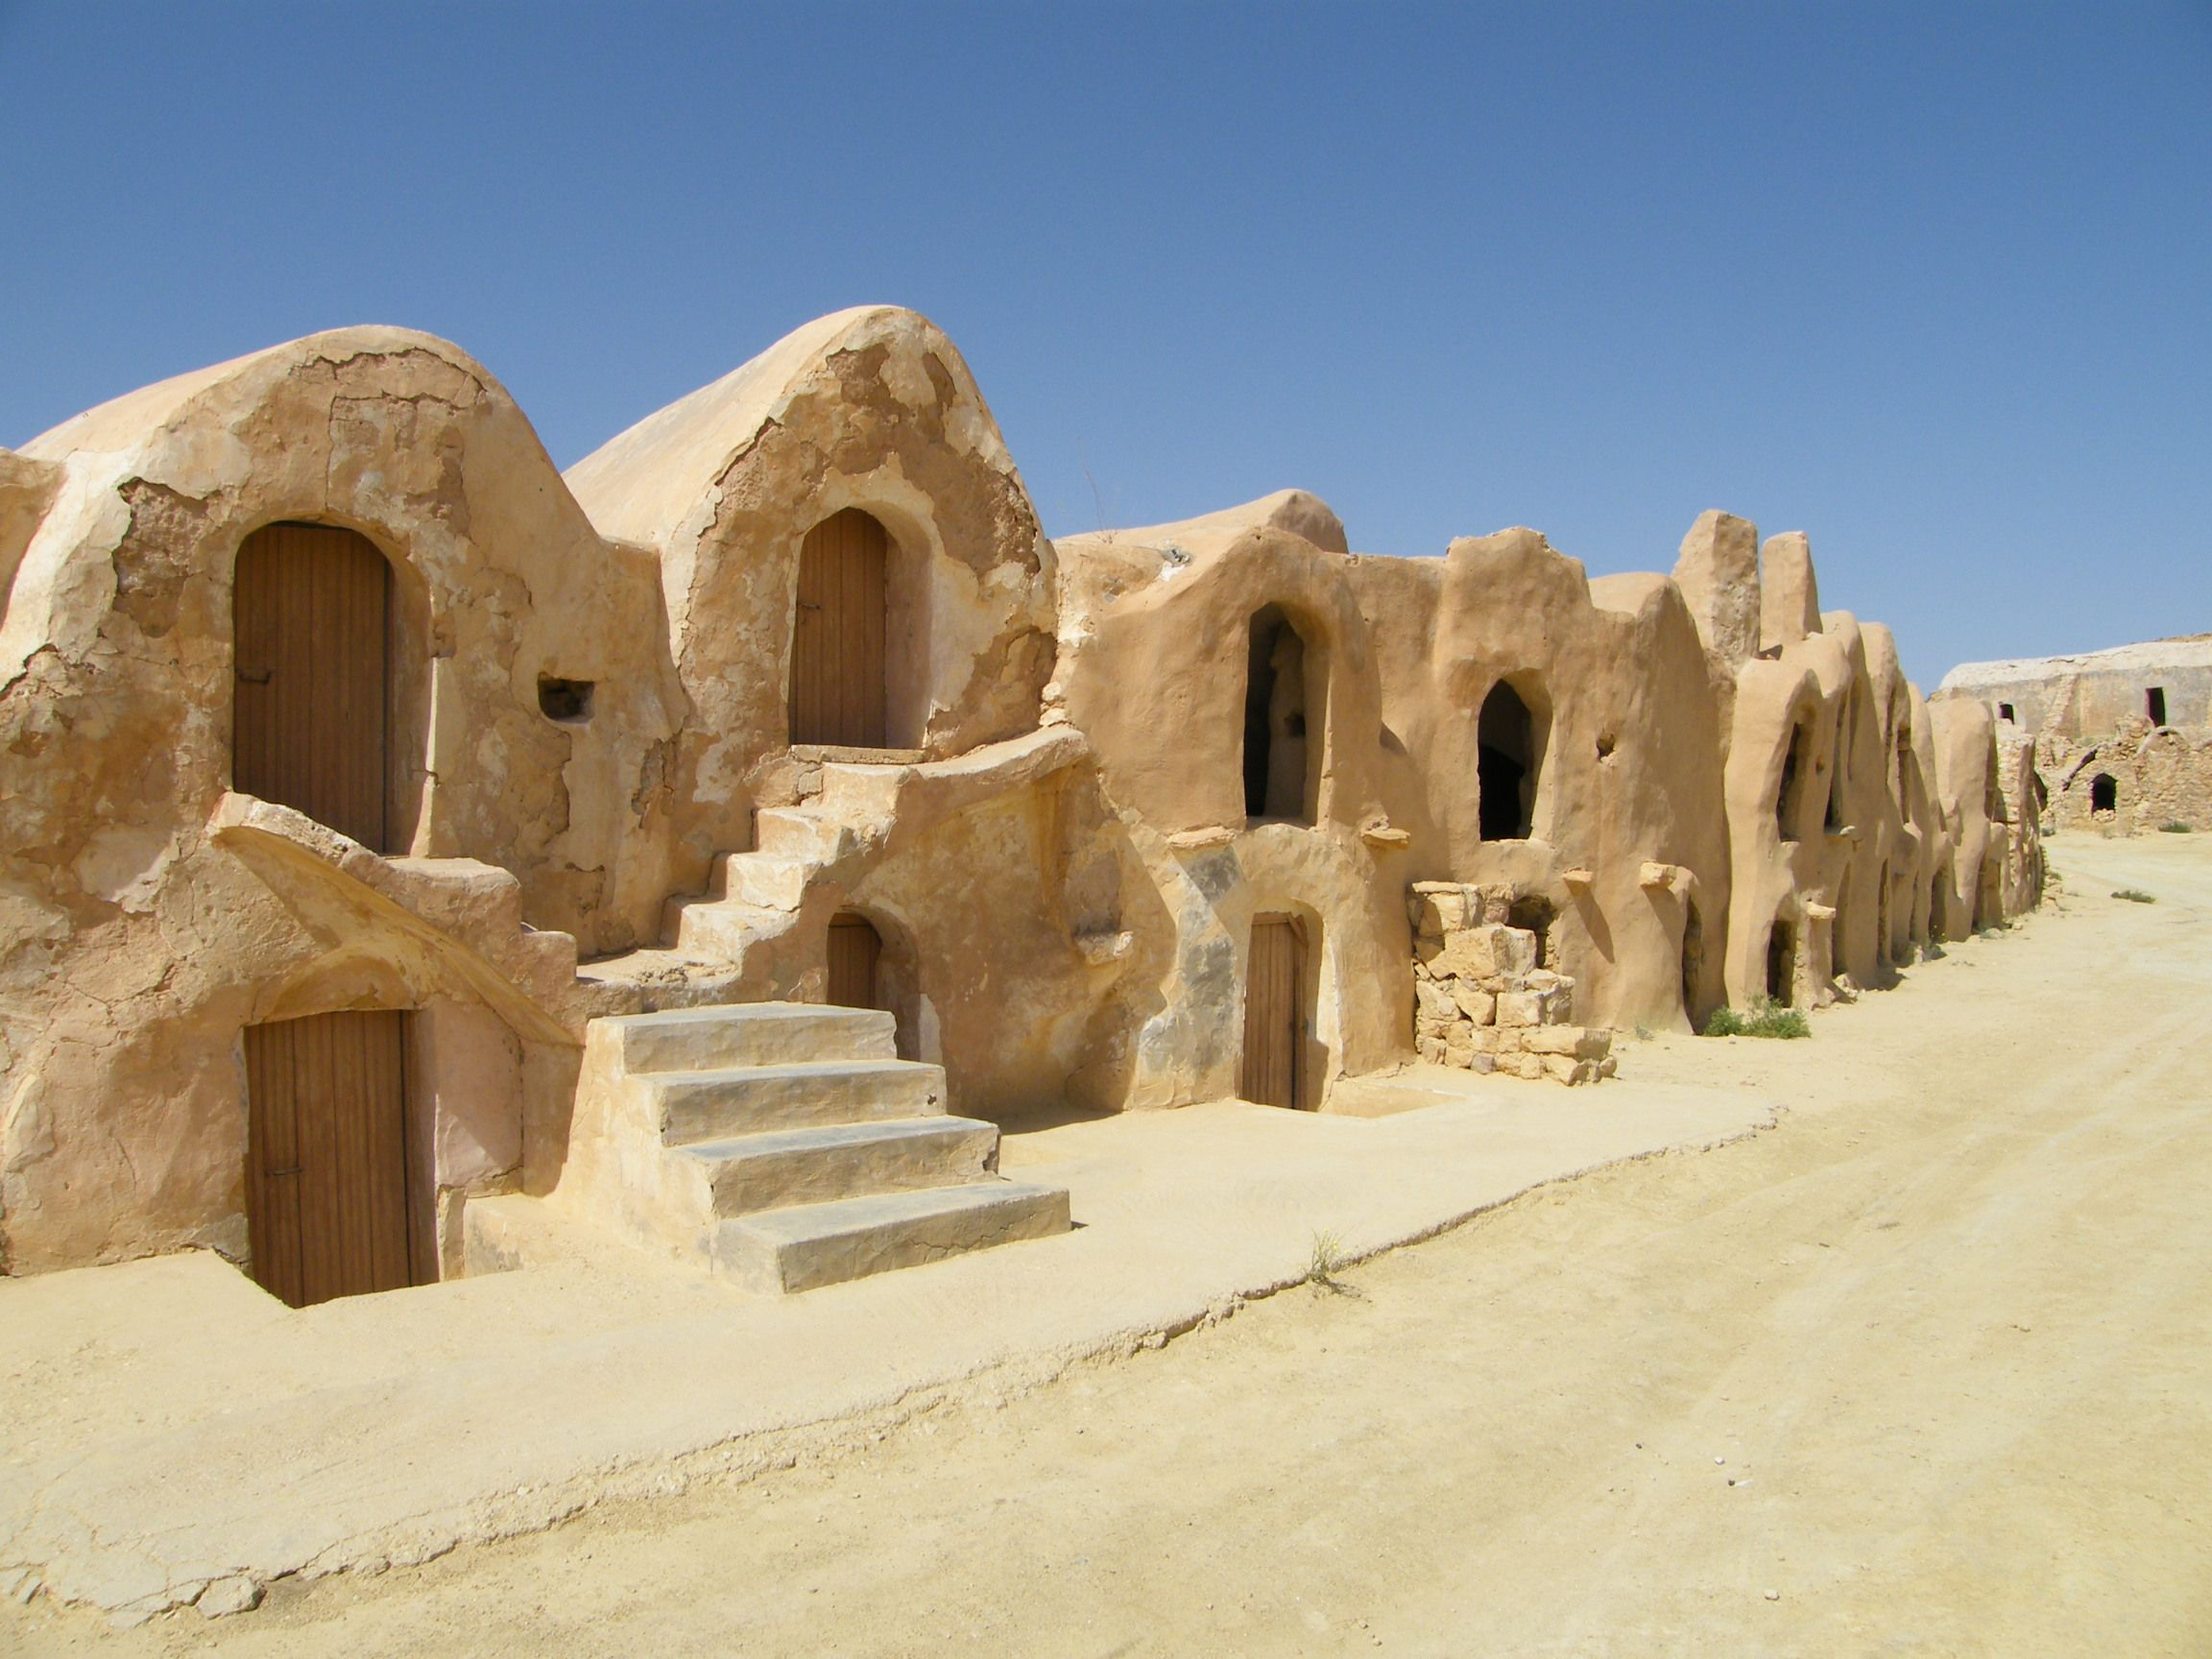 Tunisie maison troglodyte troglos pinterest maison for Architecture troglodyte